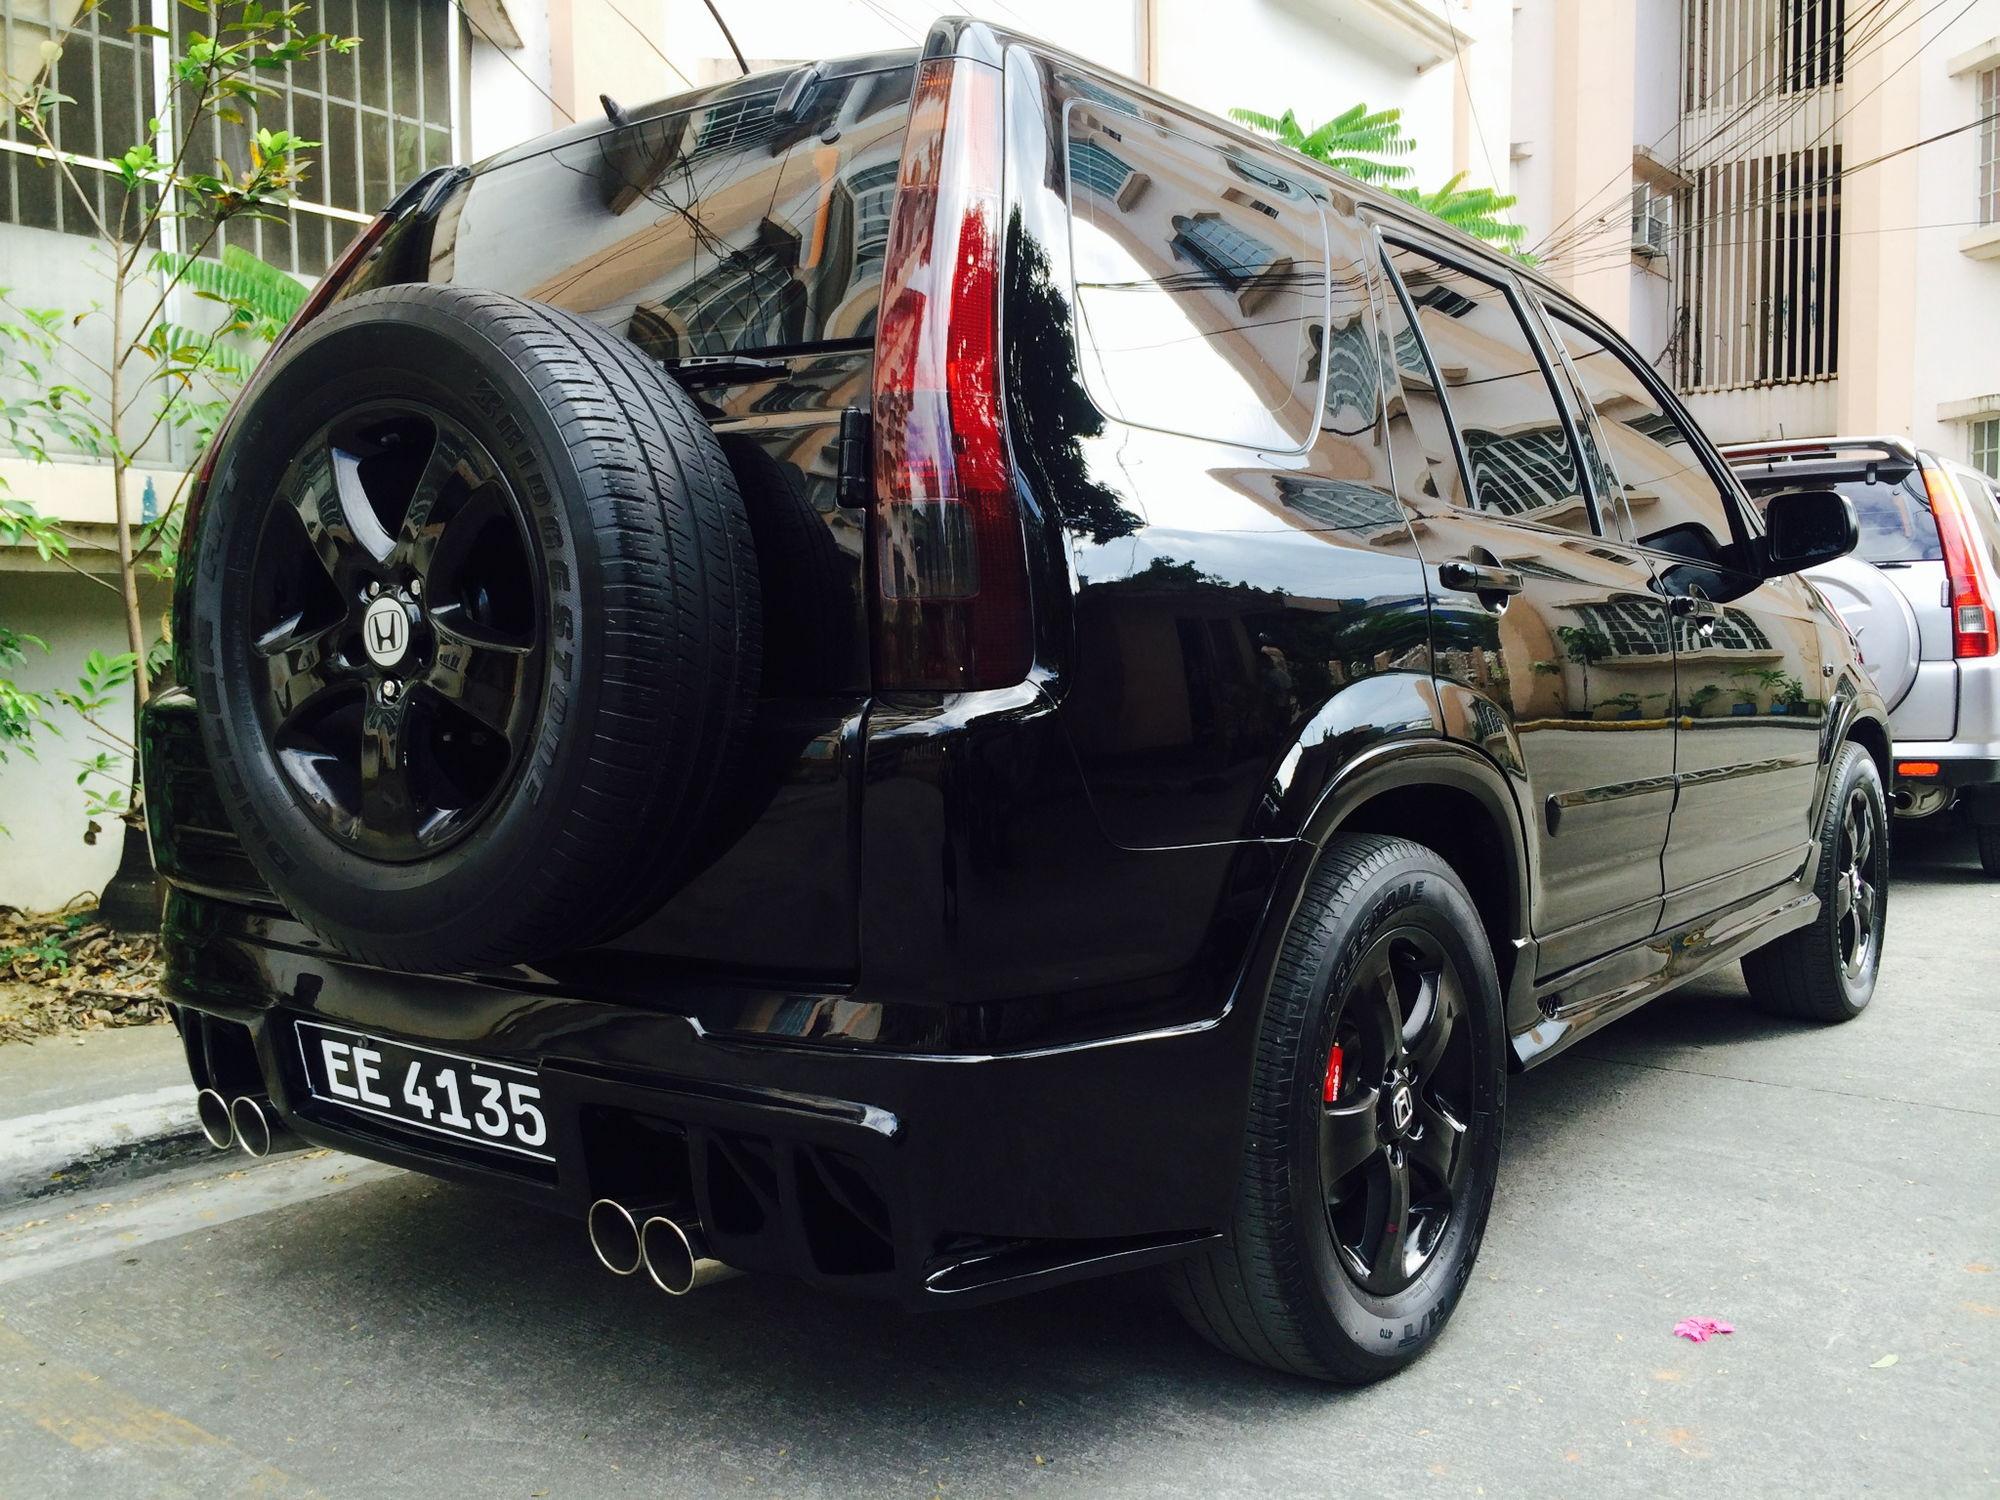 Newbie 2nd Gen CRV Owner: complete makeover on '02 V - Honda-Tech - Honda Forum Discussion